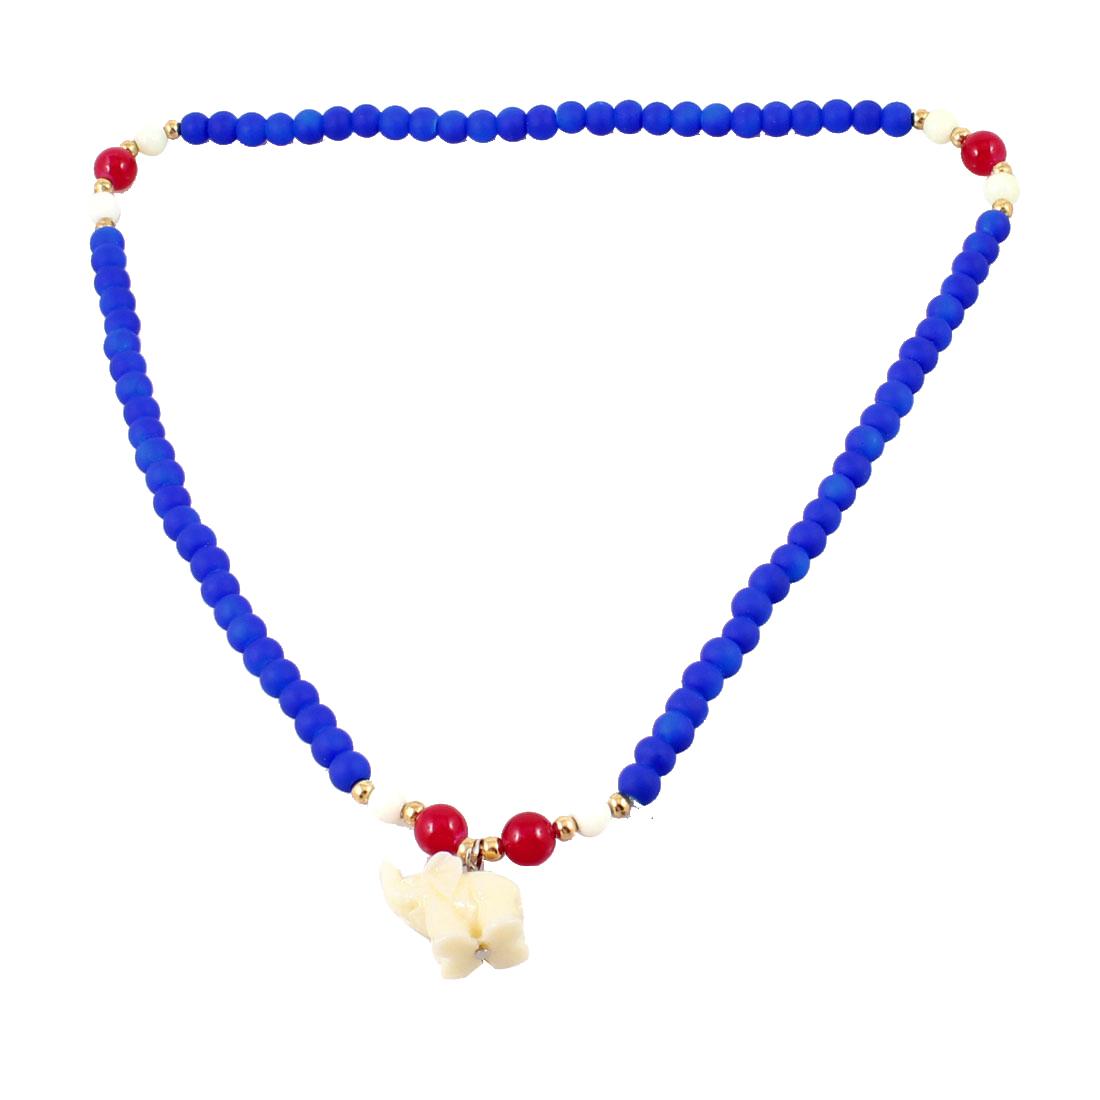 Lady Elephant Decor Pendant Plastic Beads Stretchy Necklace Ring Dark Blue